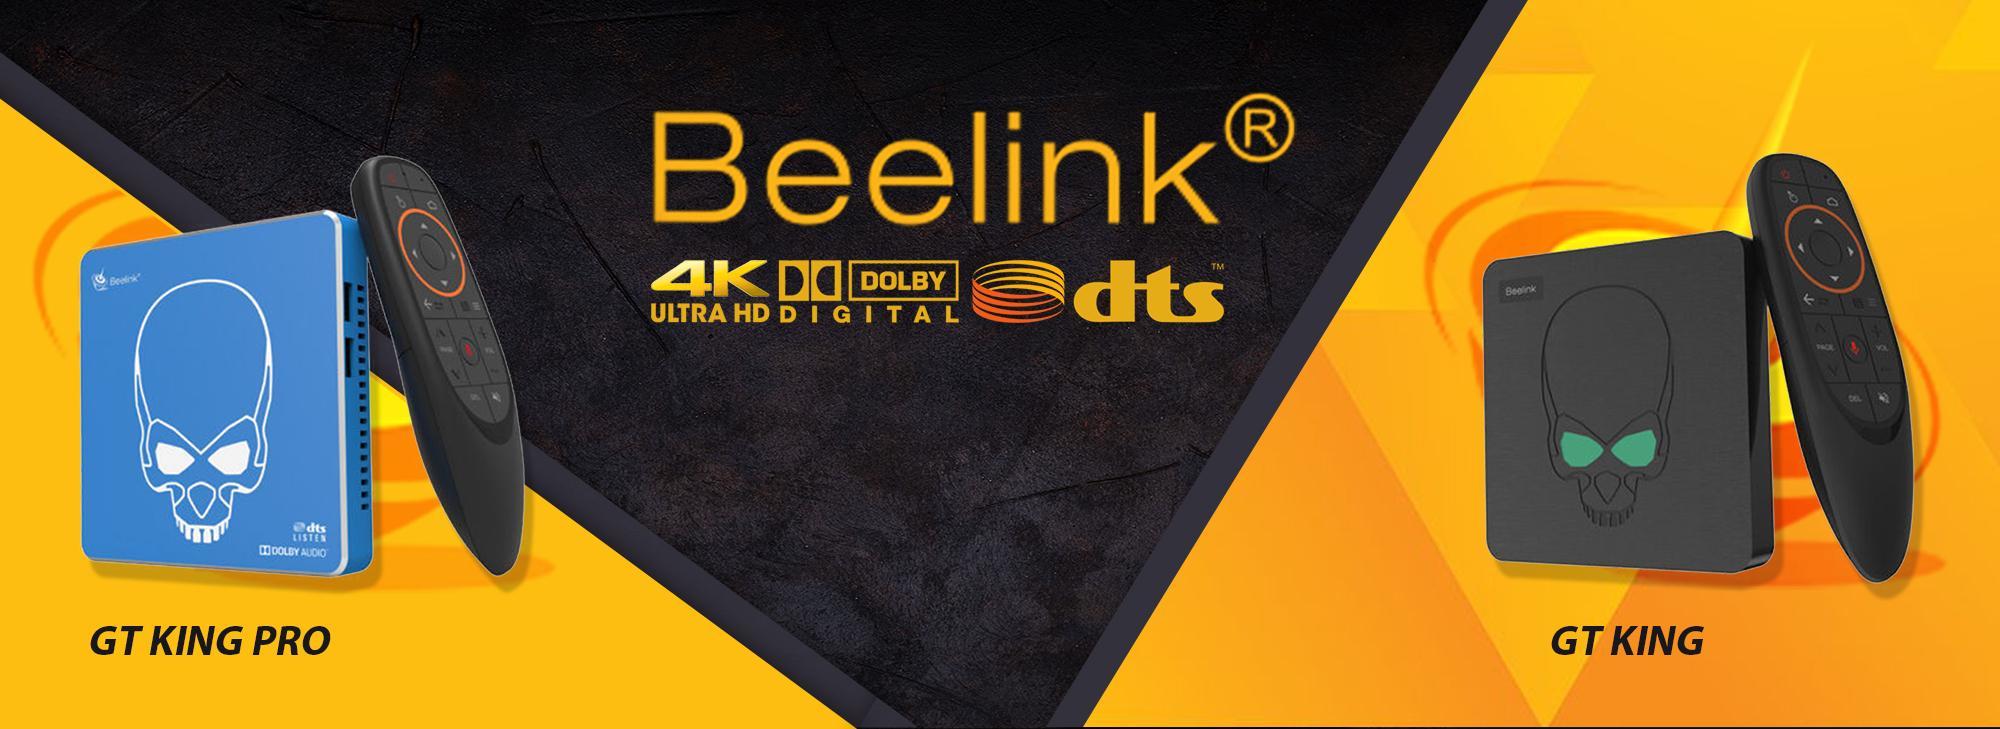 Beelink